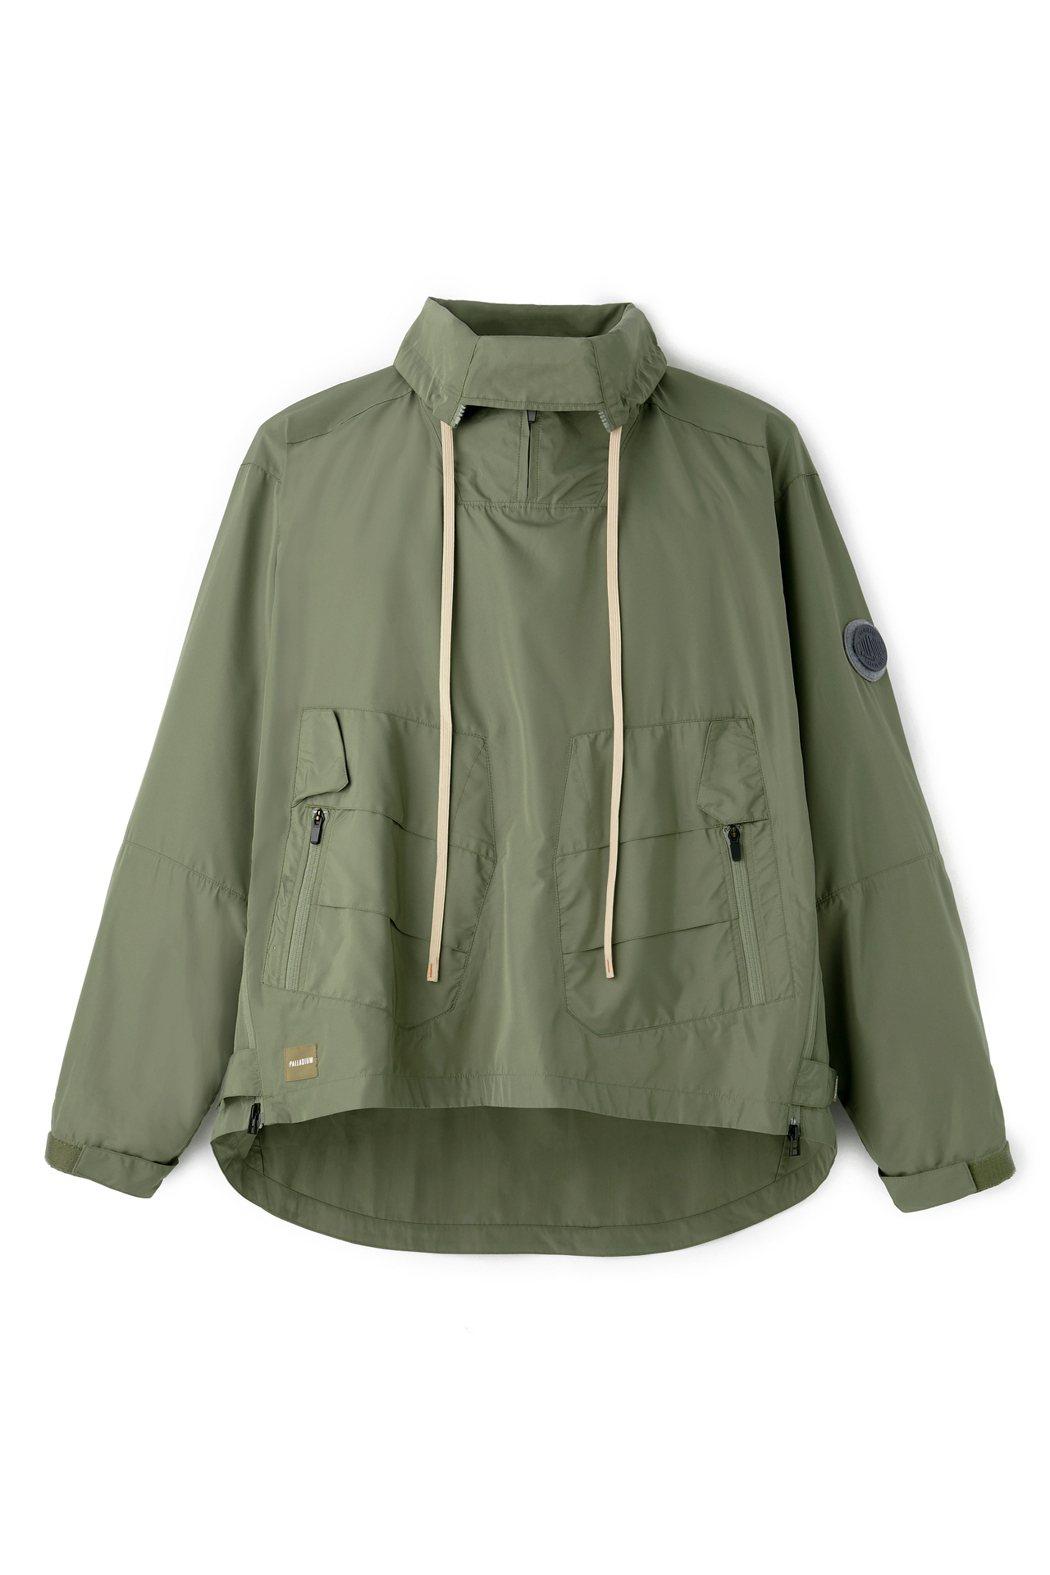 Palladium衝鋒衣4,490元。圖/Palladium提供